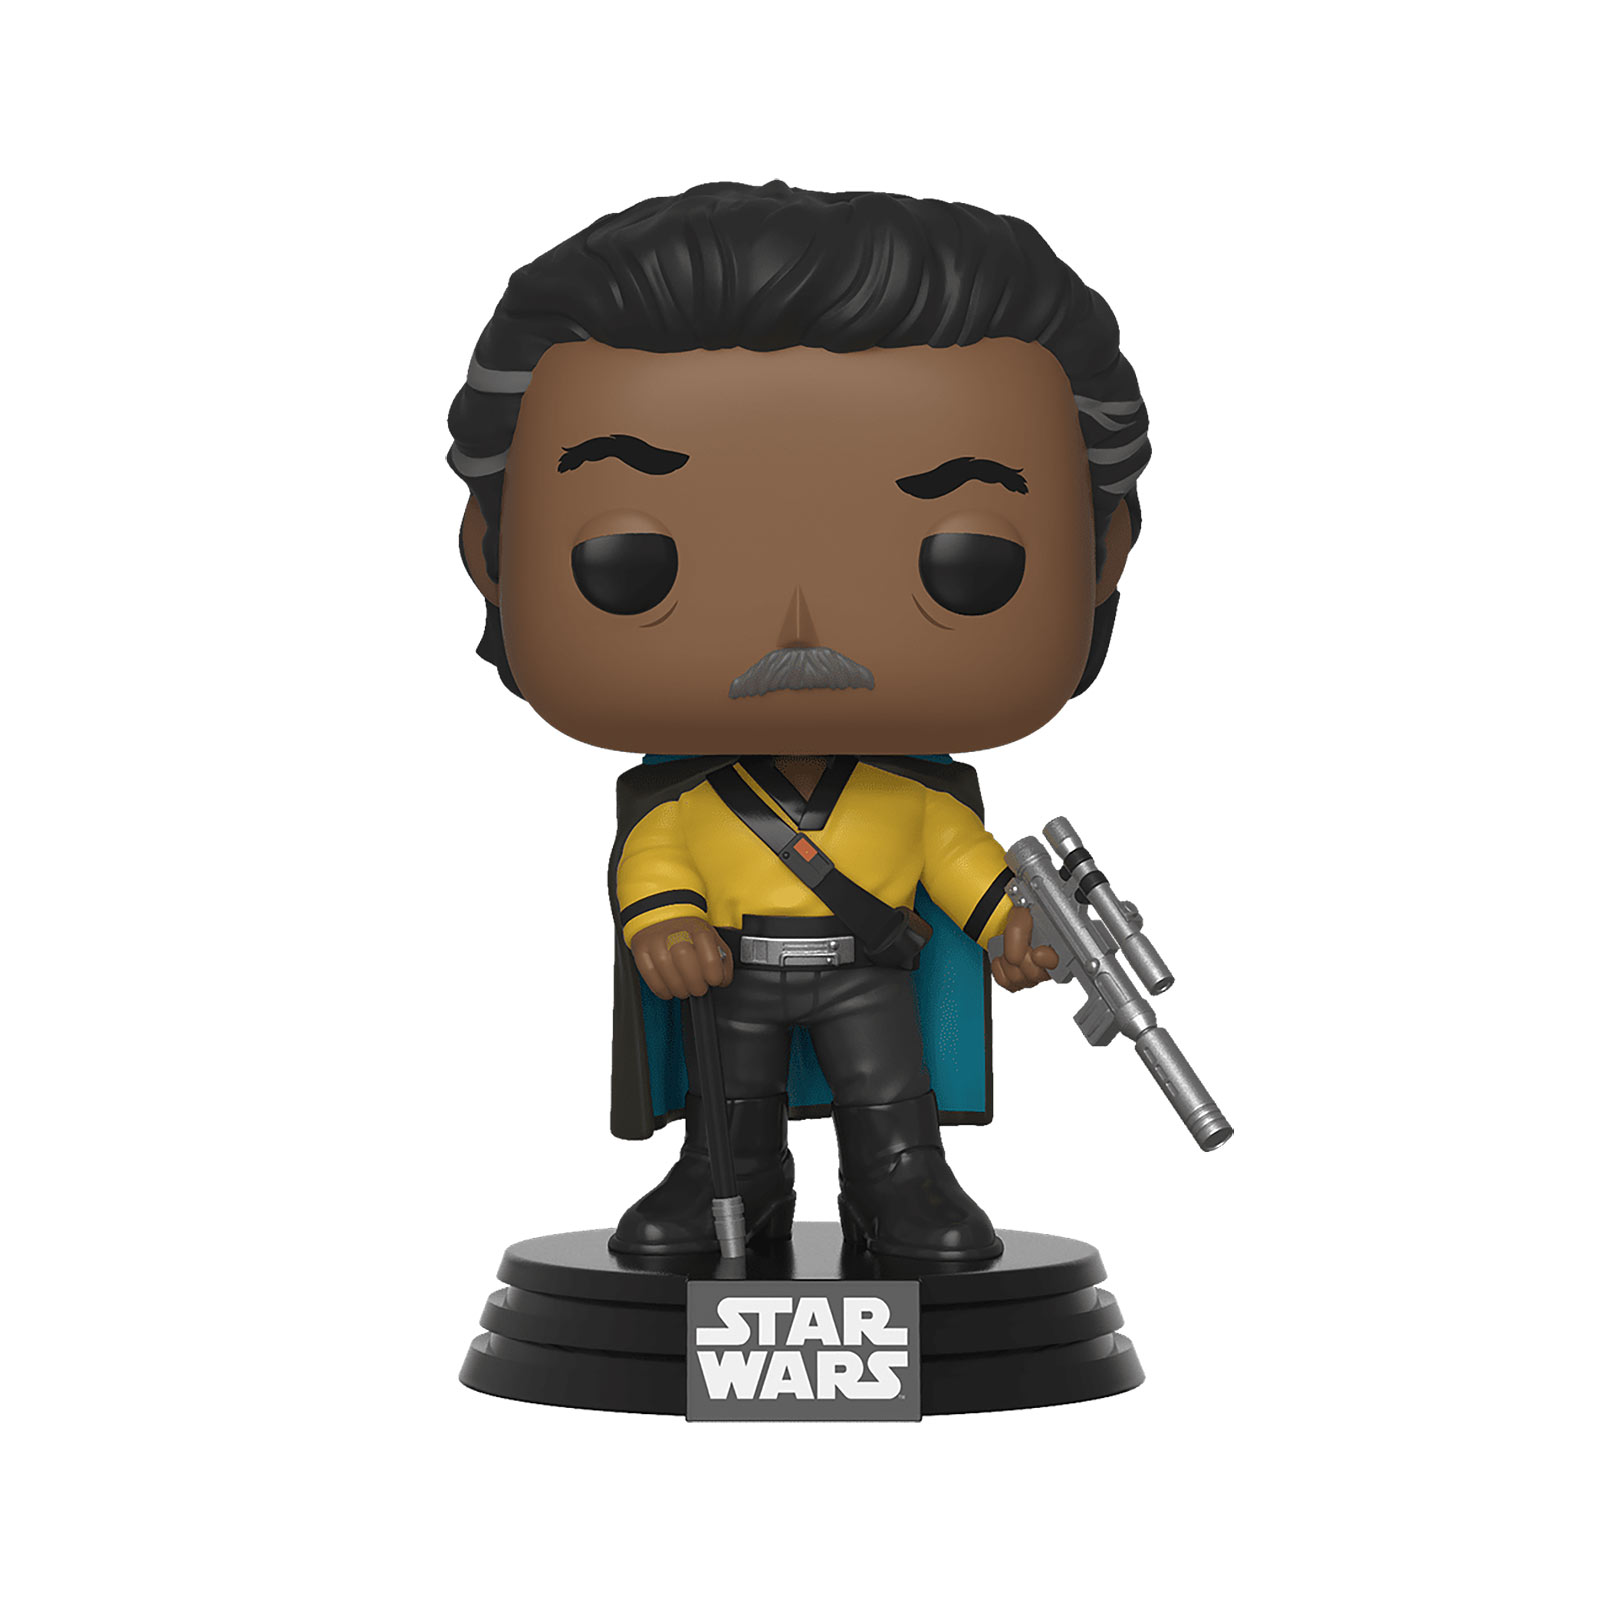 Star Wars - Lando Calrissian Episode 9 Funko Pop Wackelkopf-Figur